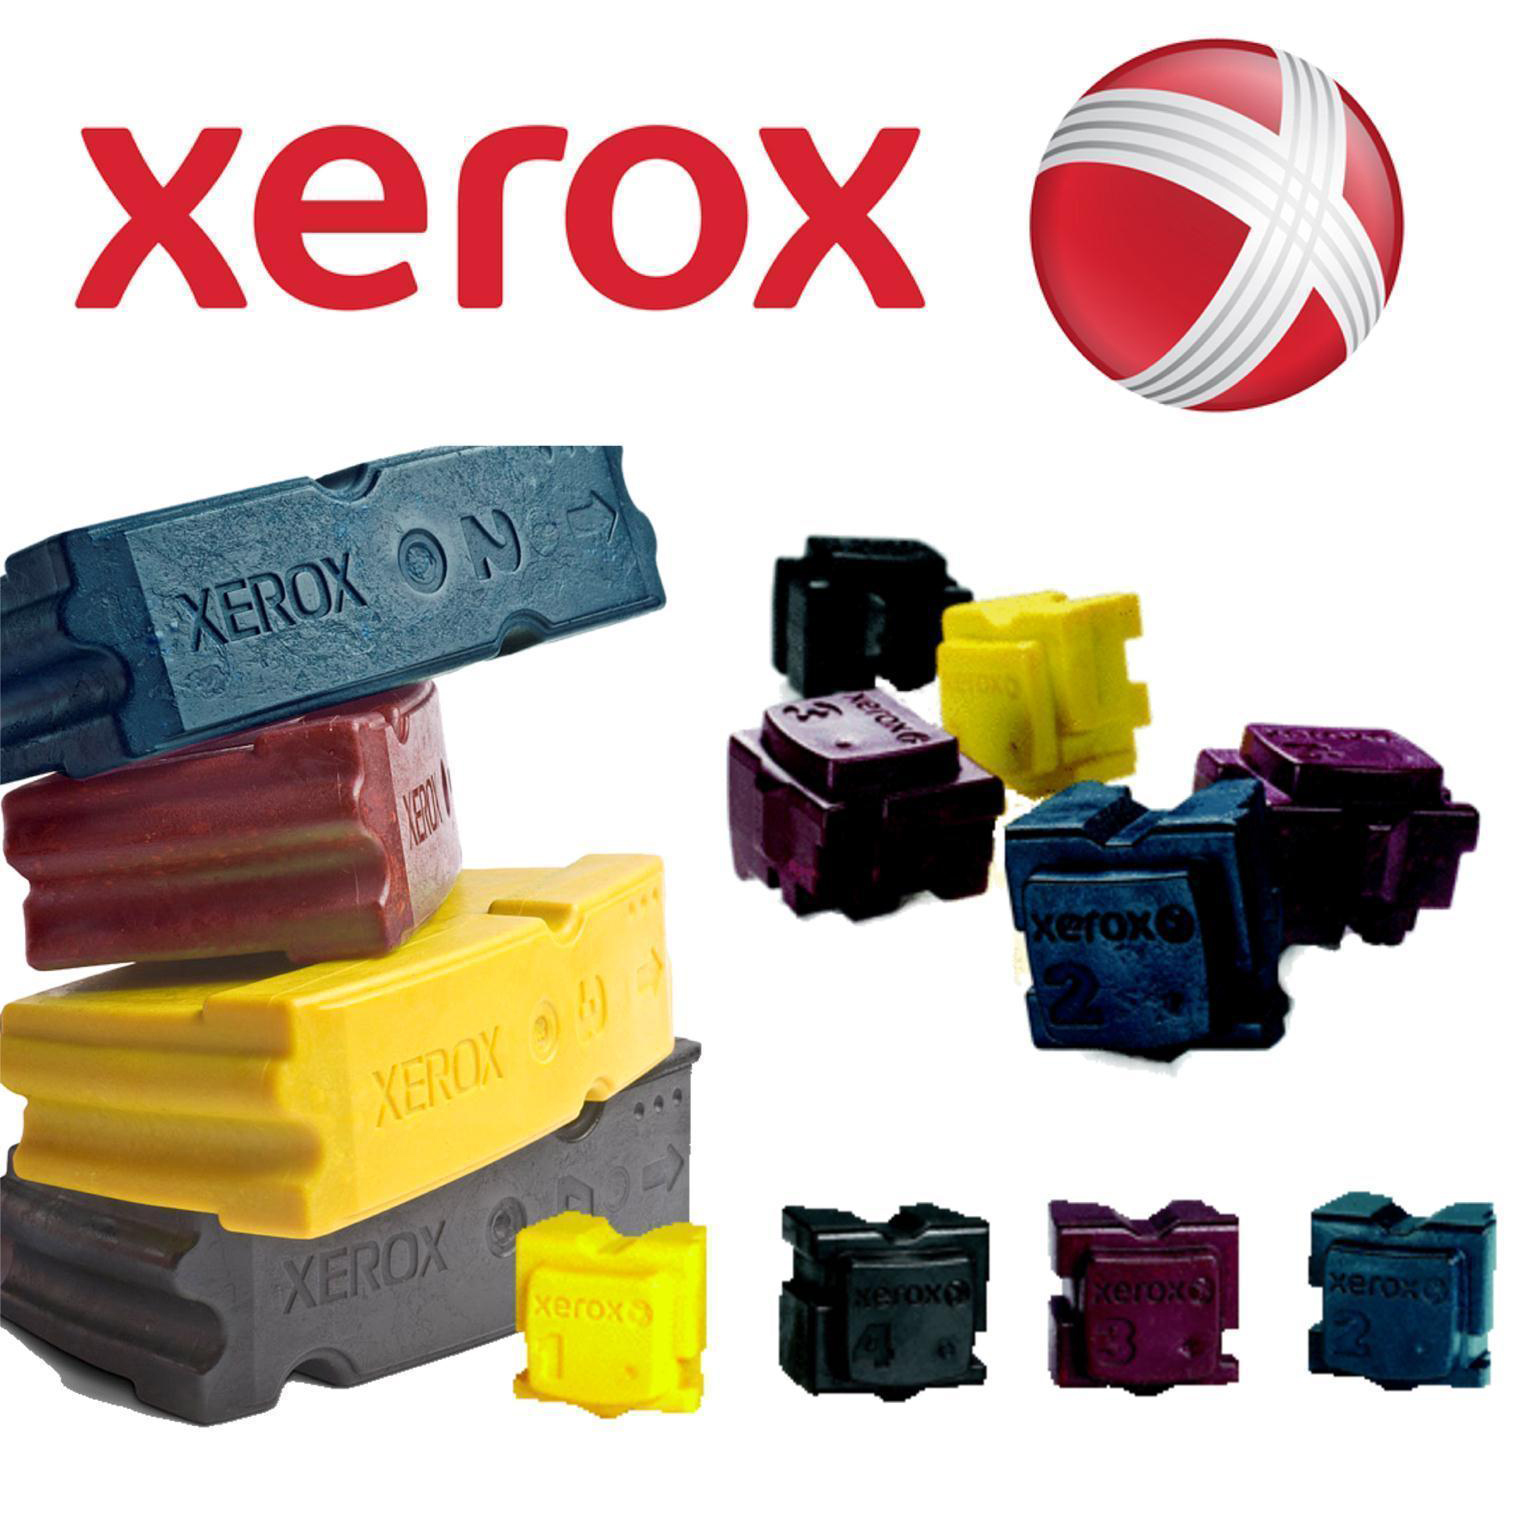 Xerox Soild Ink Sticks Page Life 4400pp Magenta Ref 108R00932 Pack 2